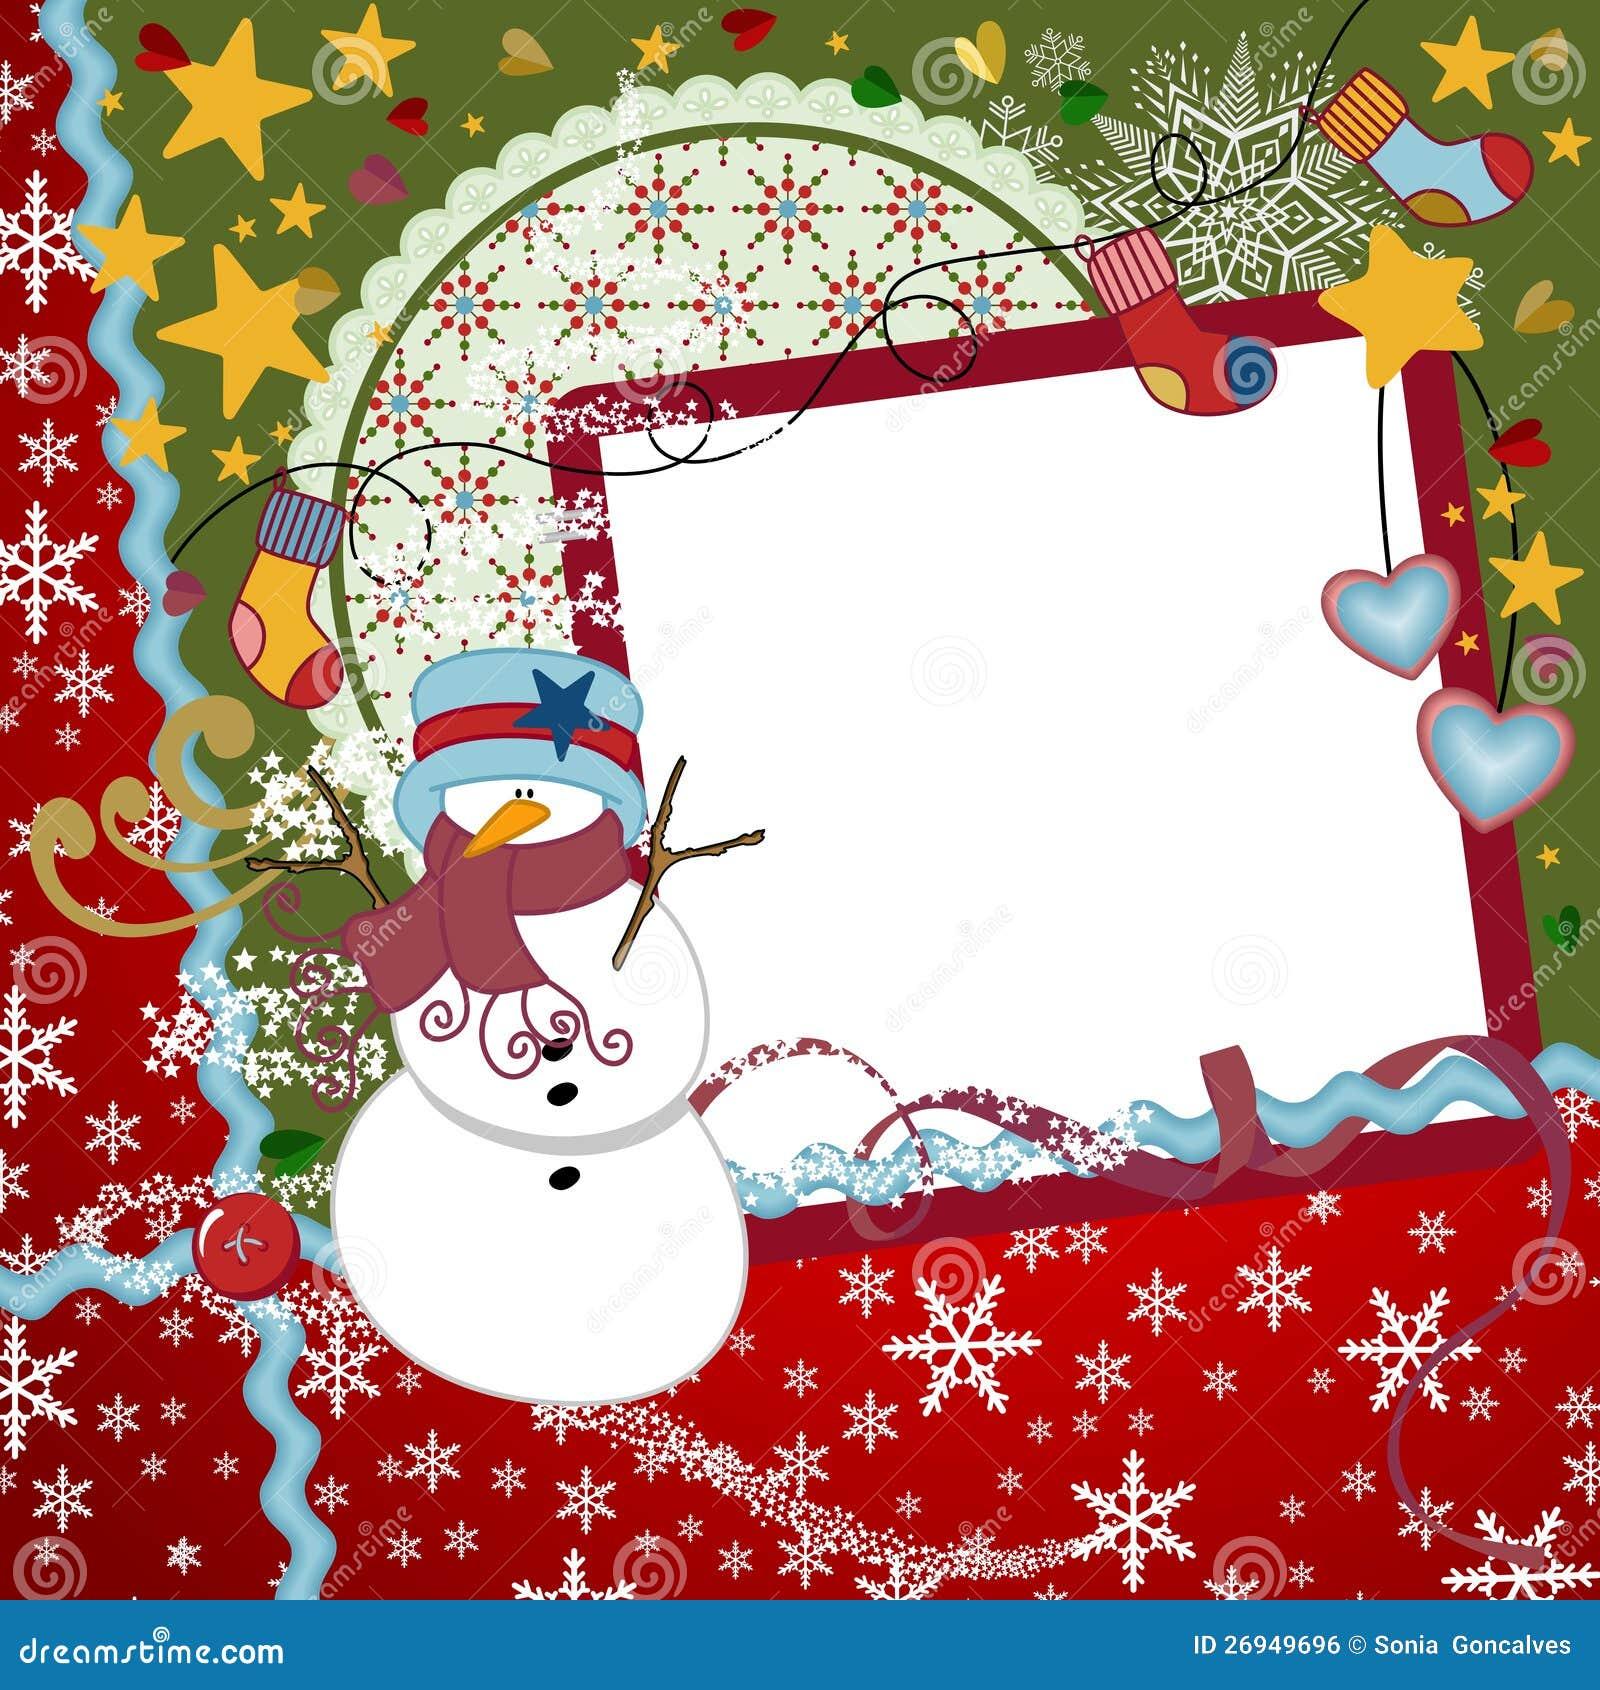 Christmas Web Design Ideas